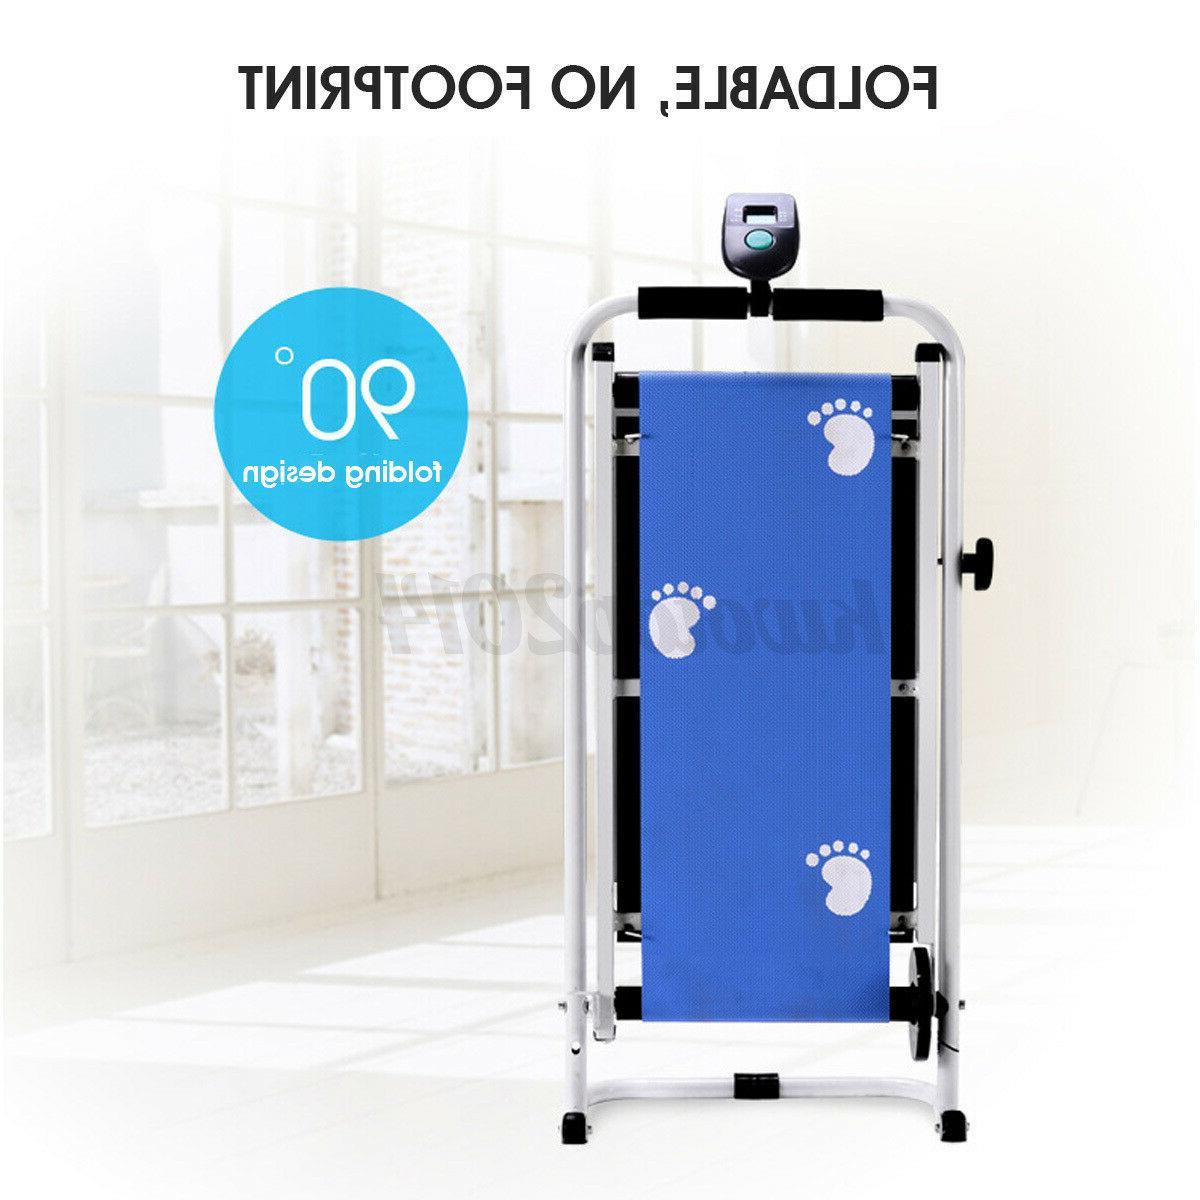 Mechanical Treadmill Fitness Folding Home Gym